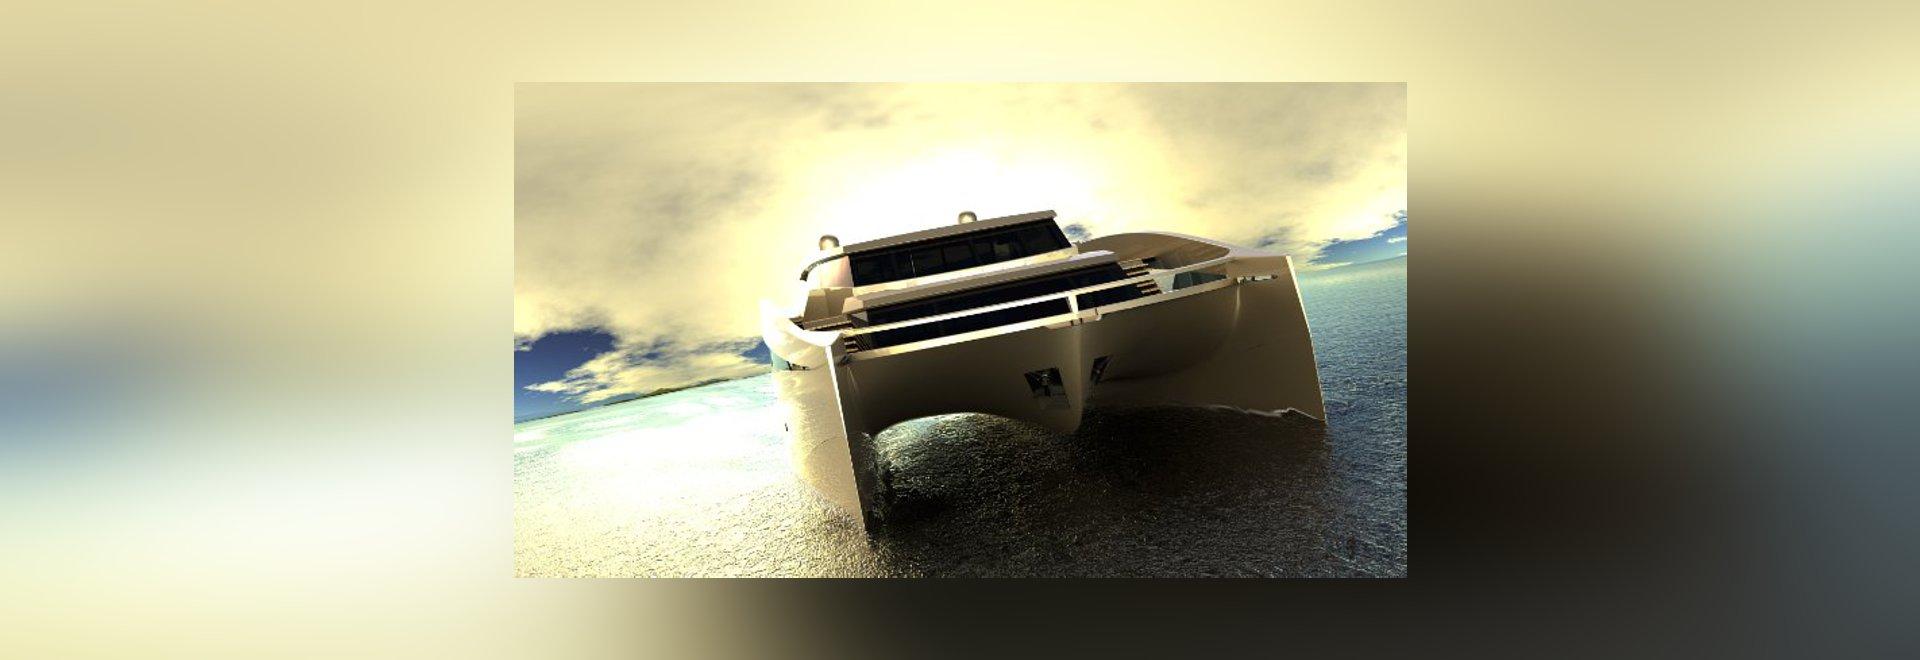 New 115ft catamaran superyacht 115 Sunreef Power concept